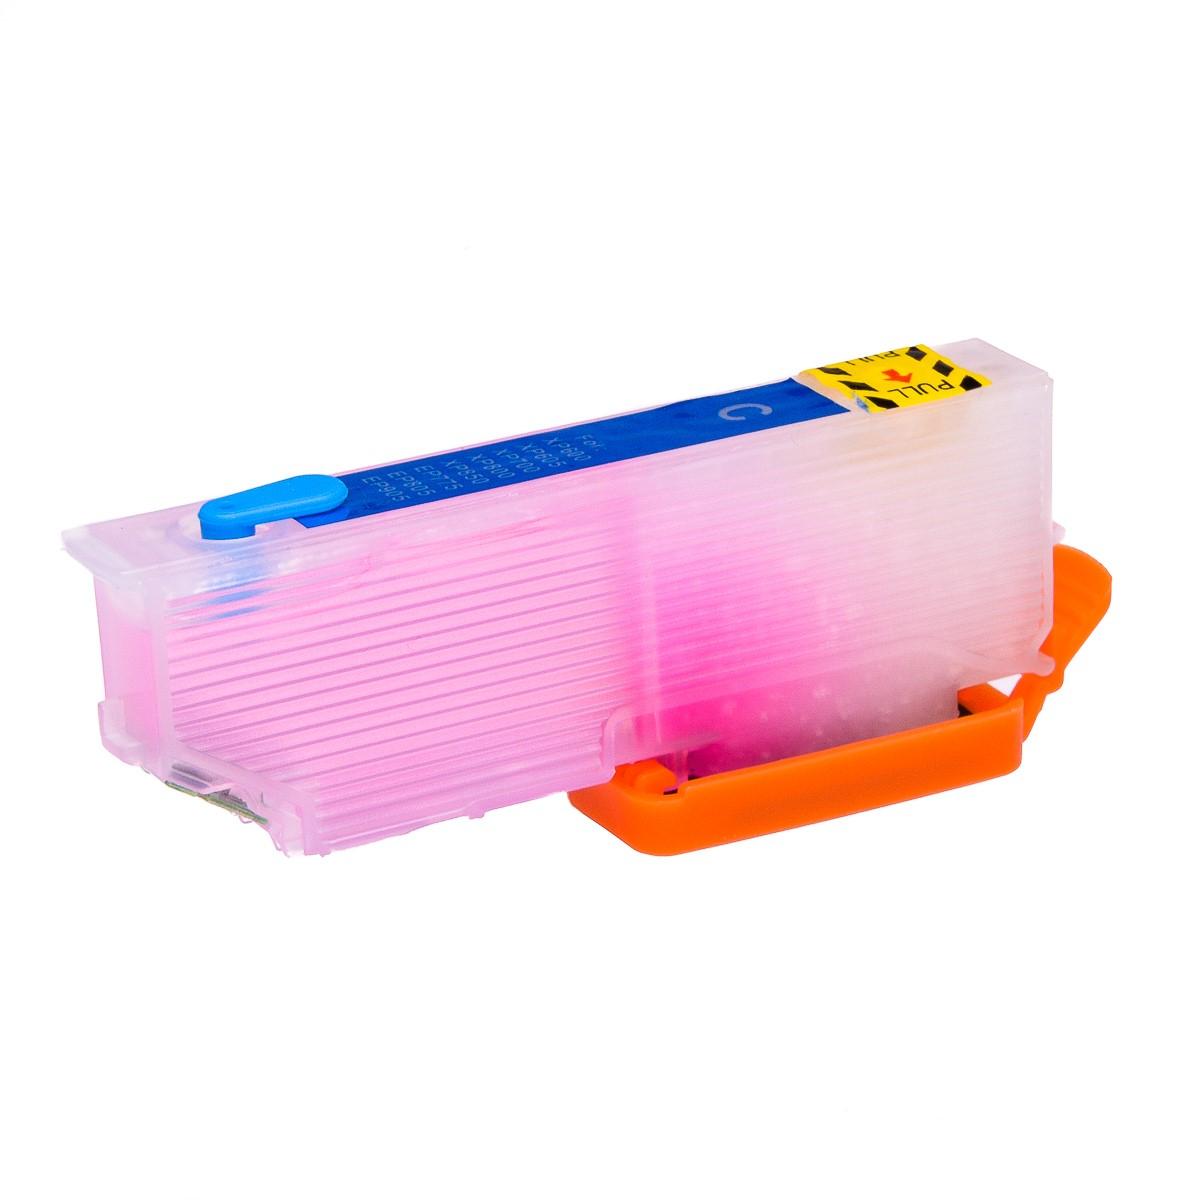 Cyan printhead cleaning cartridge for Epson XP-645 printer